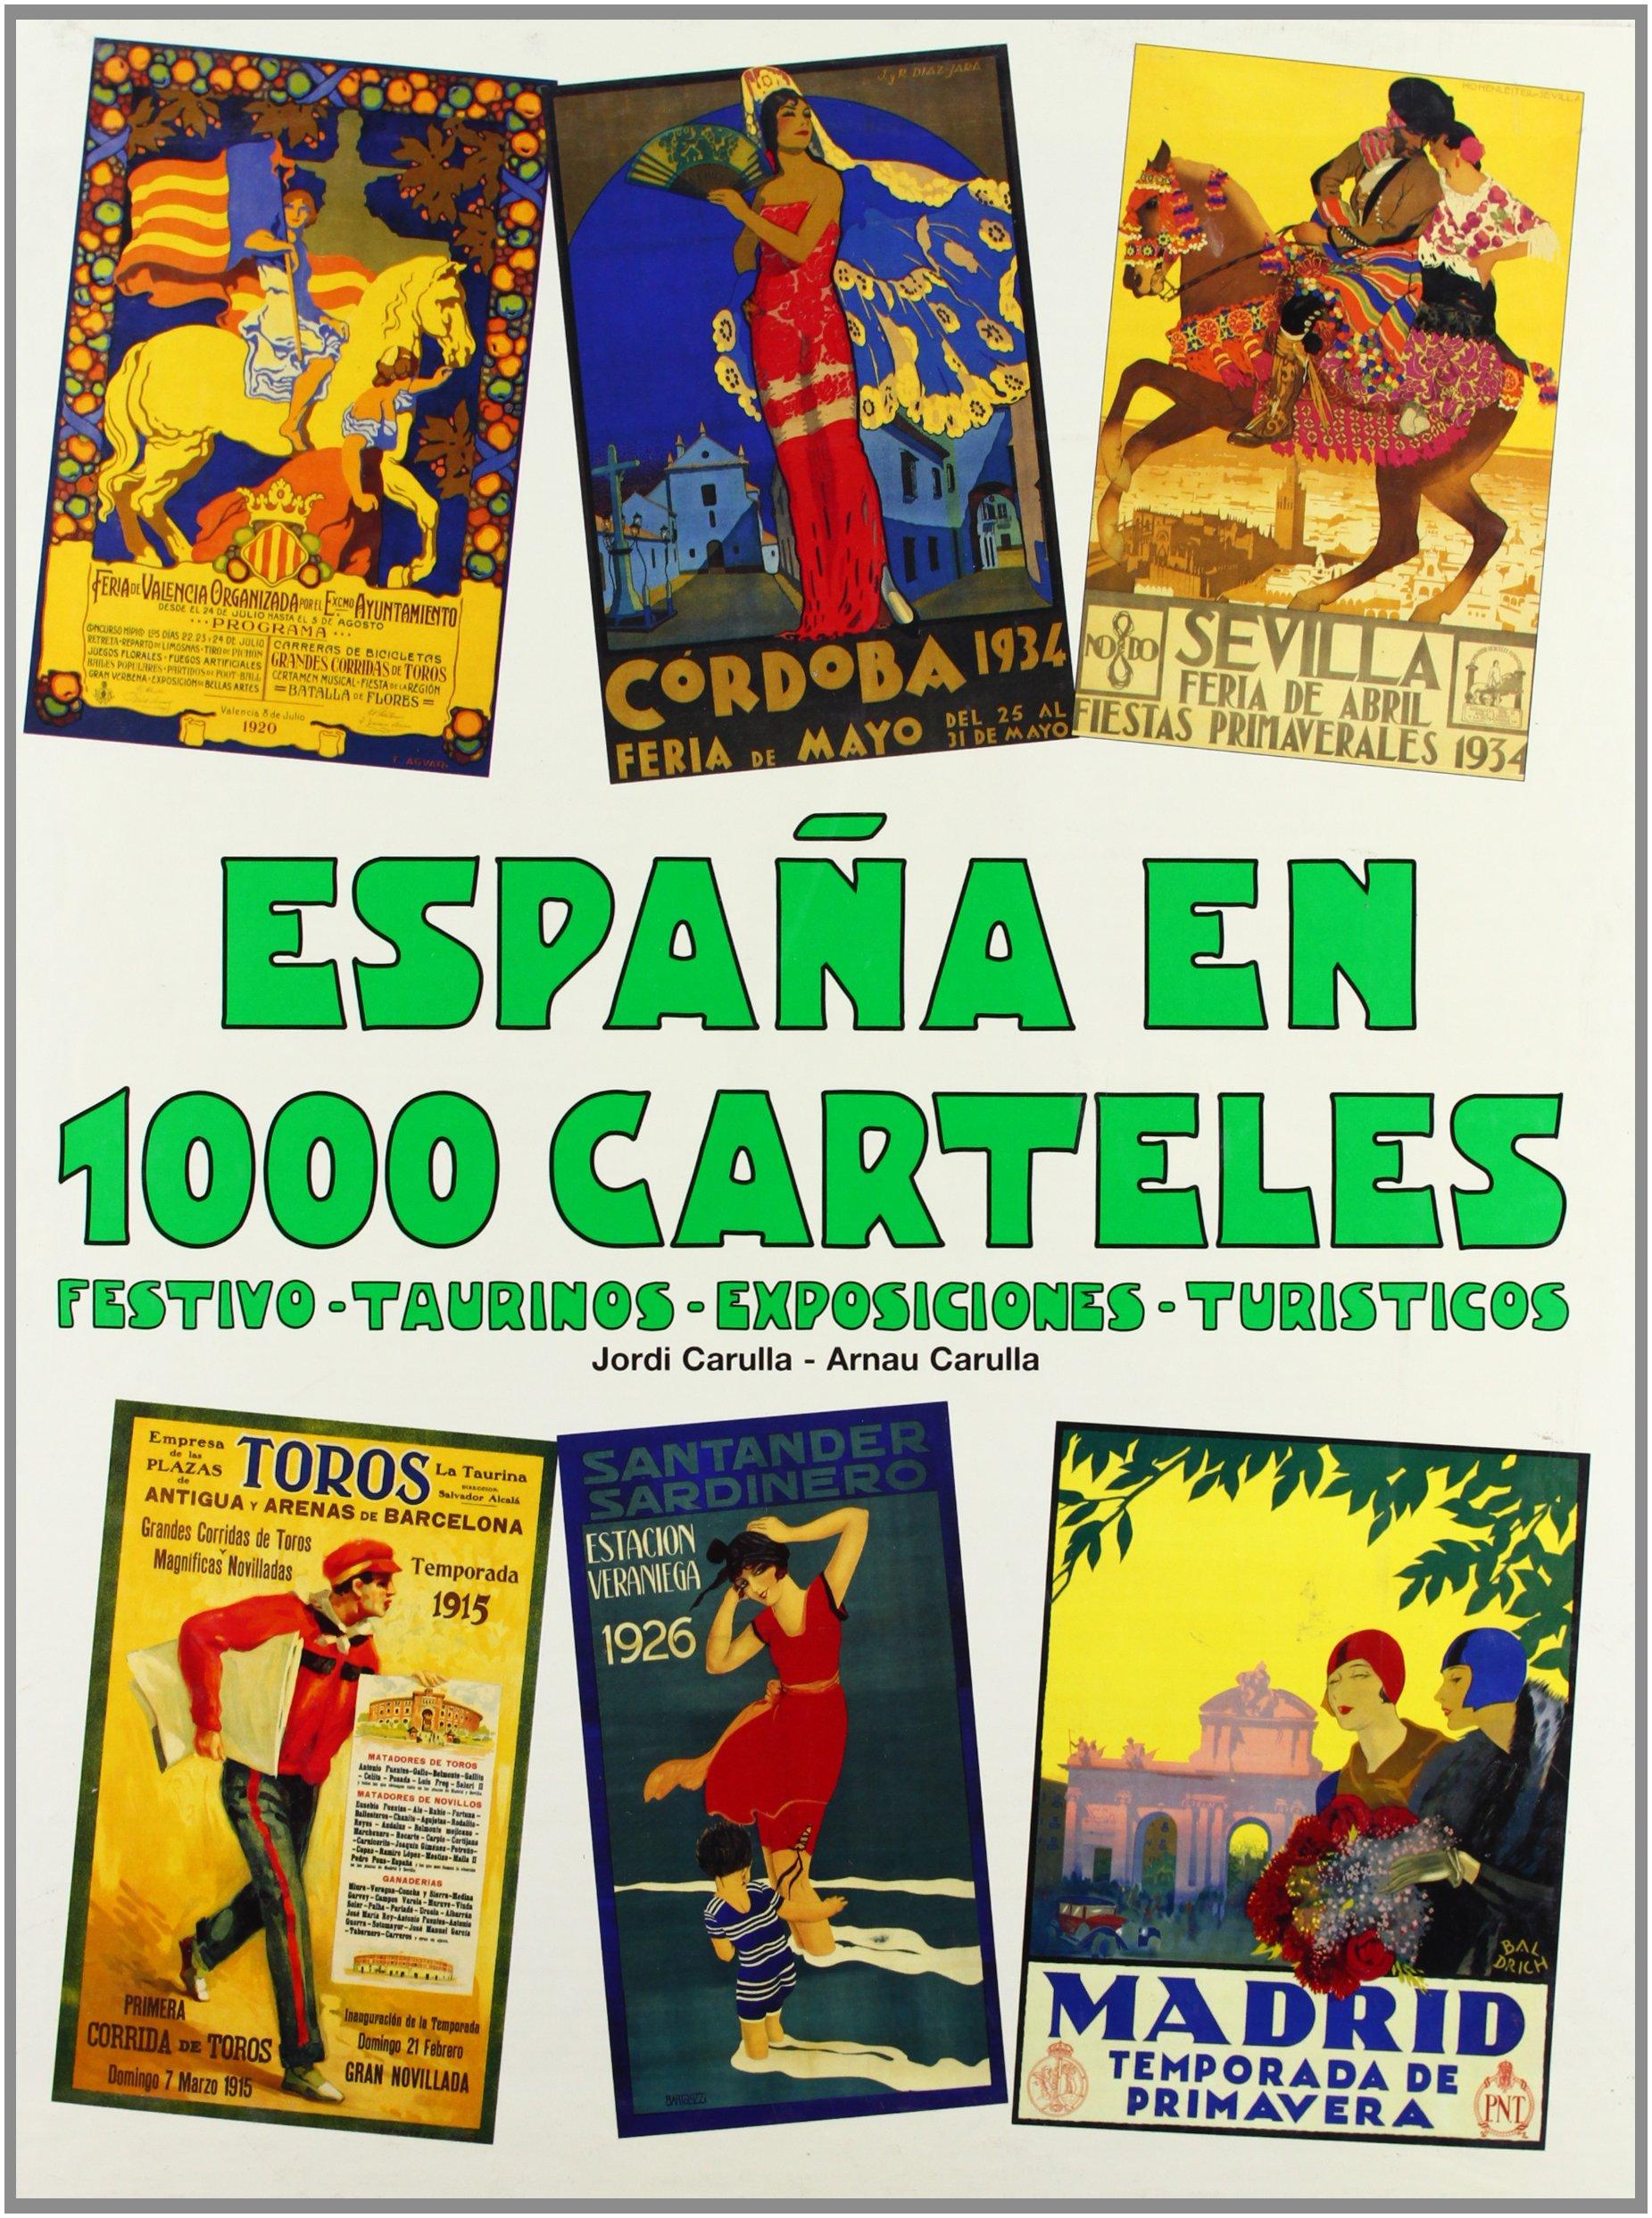 Espana En 1000 Carteles (Spanish Edition): Jordi Carulla ...